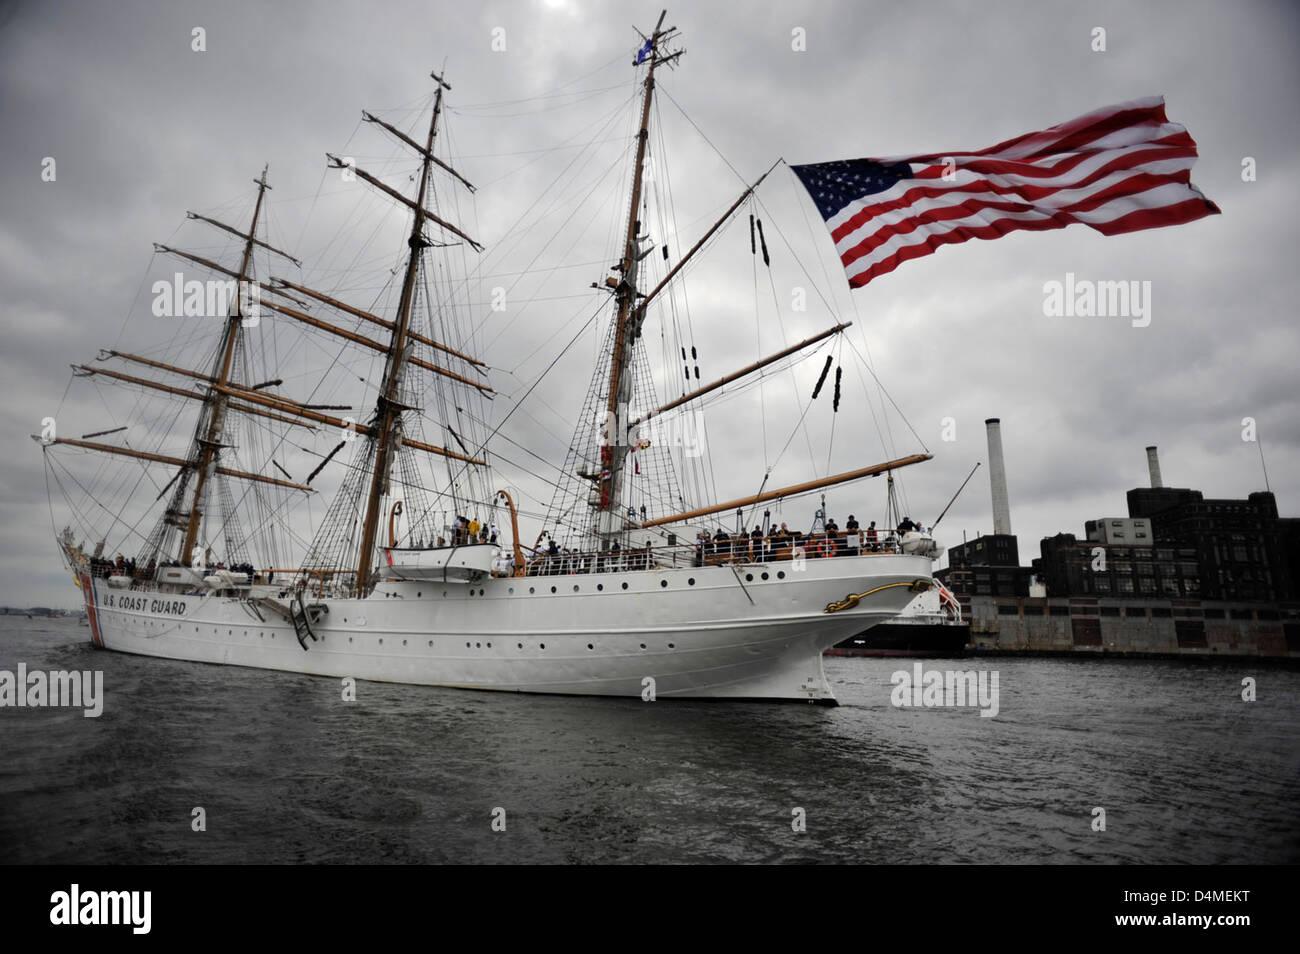 CGC Eagle departs Baltimore's Inner Harbor - Stock Image